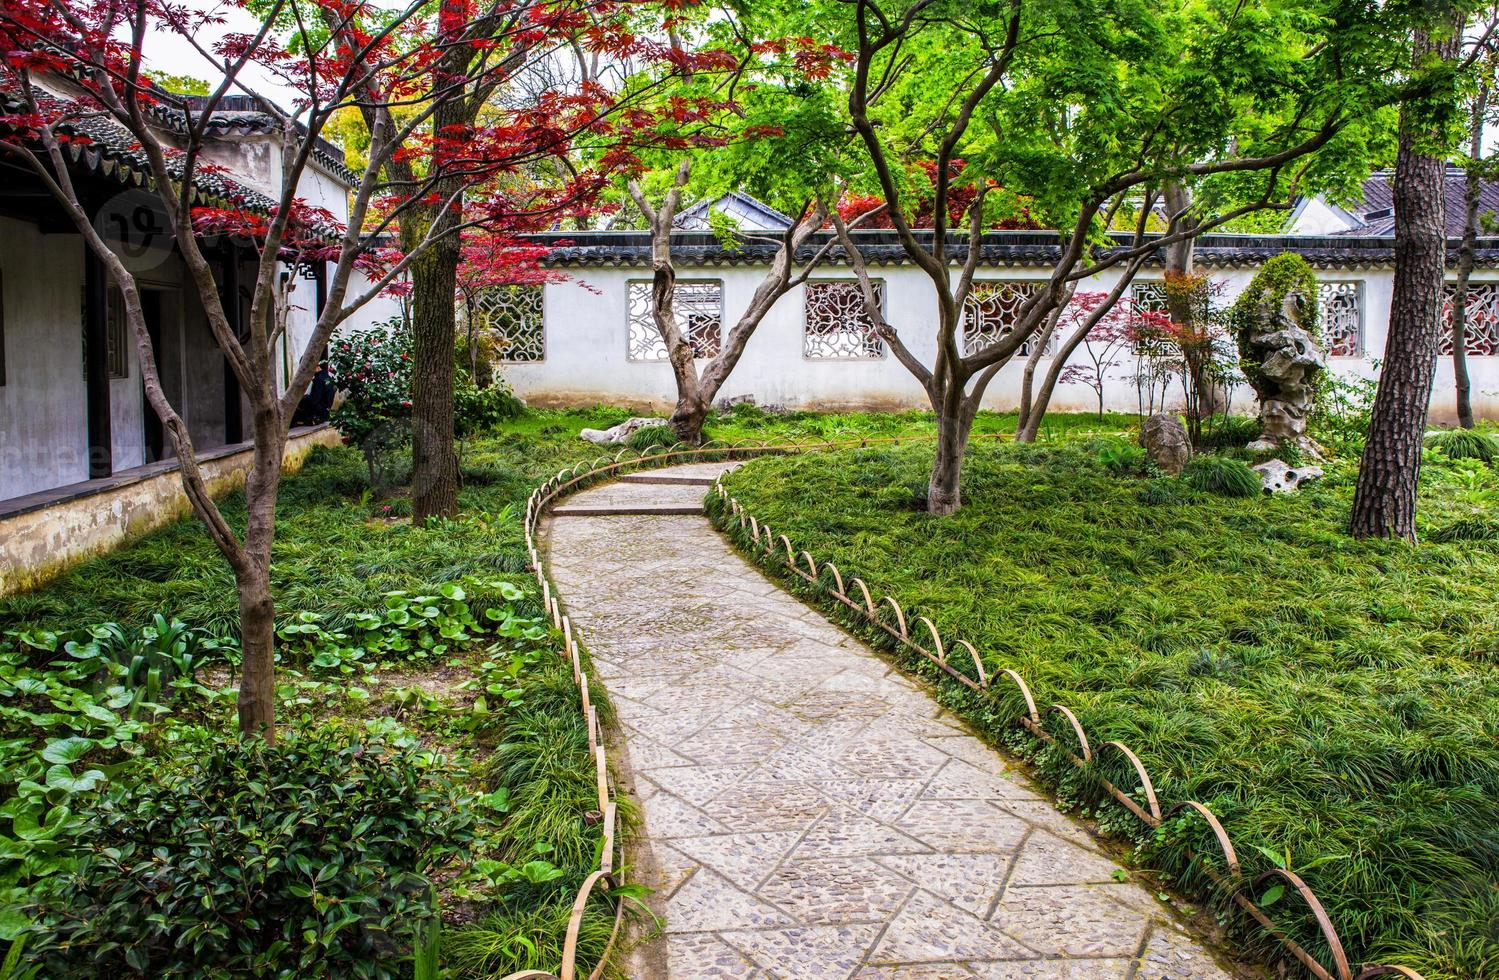 ödmjuk administratörs (zhuozheng) trädgård foto